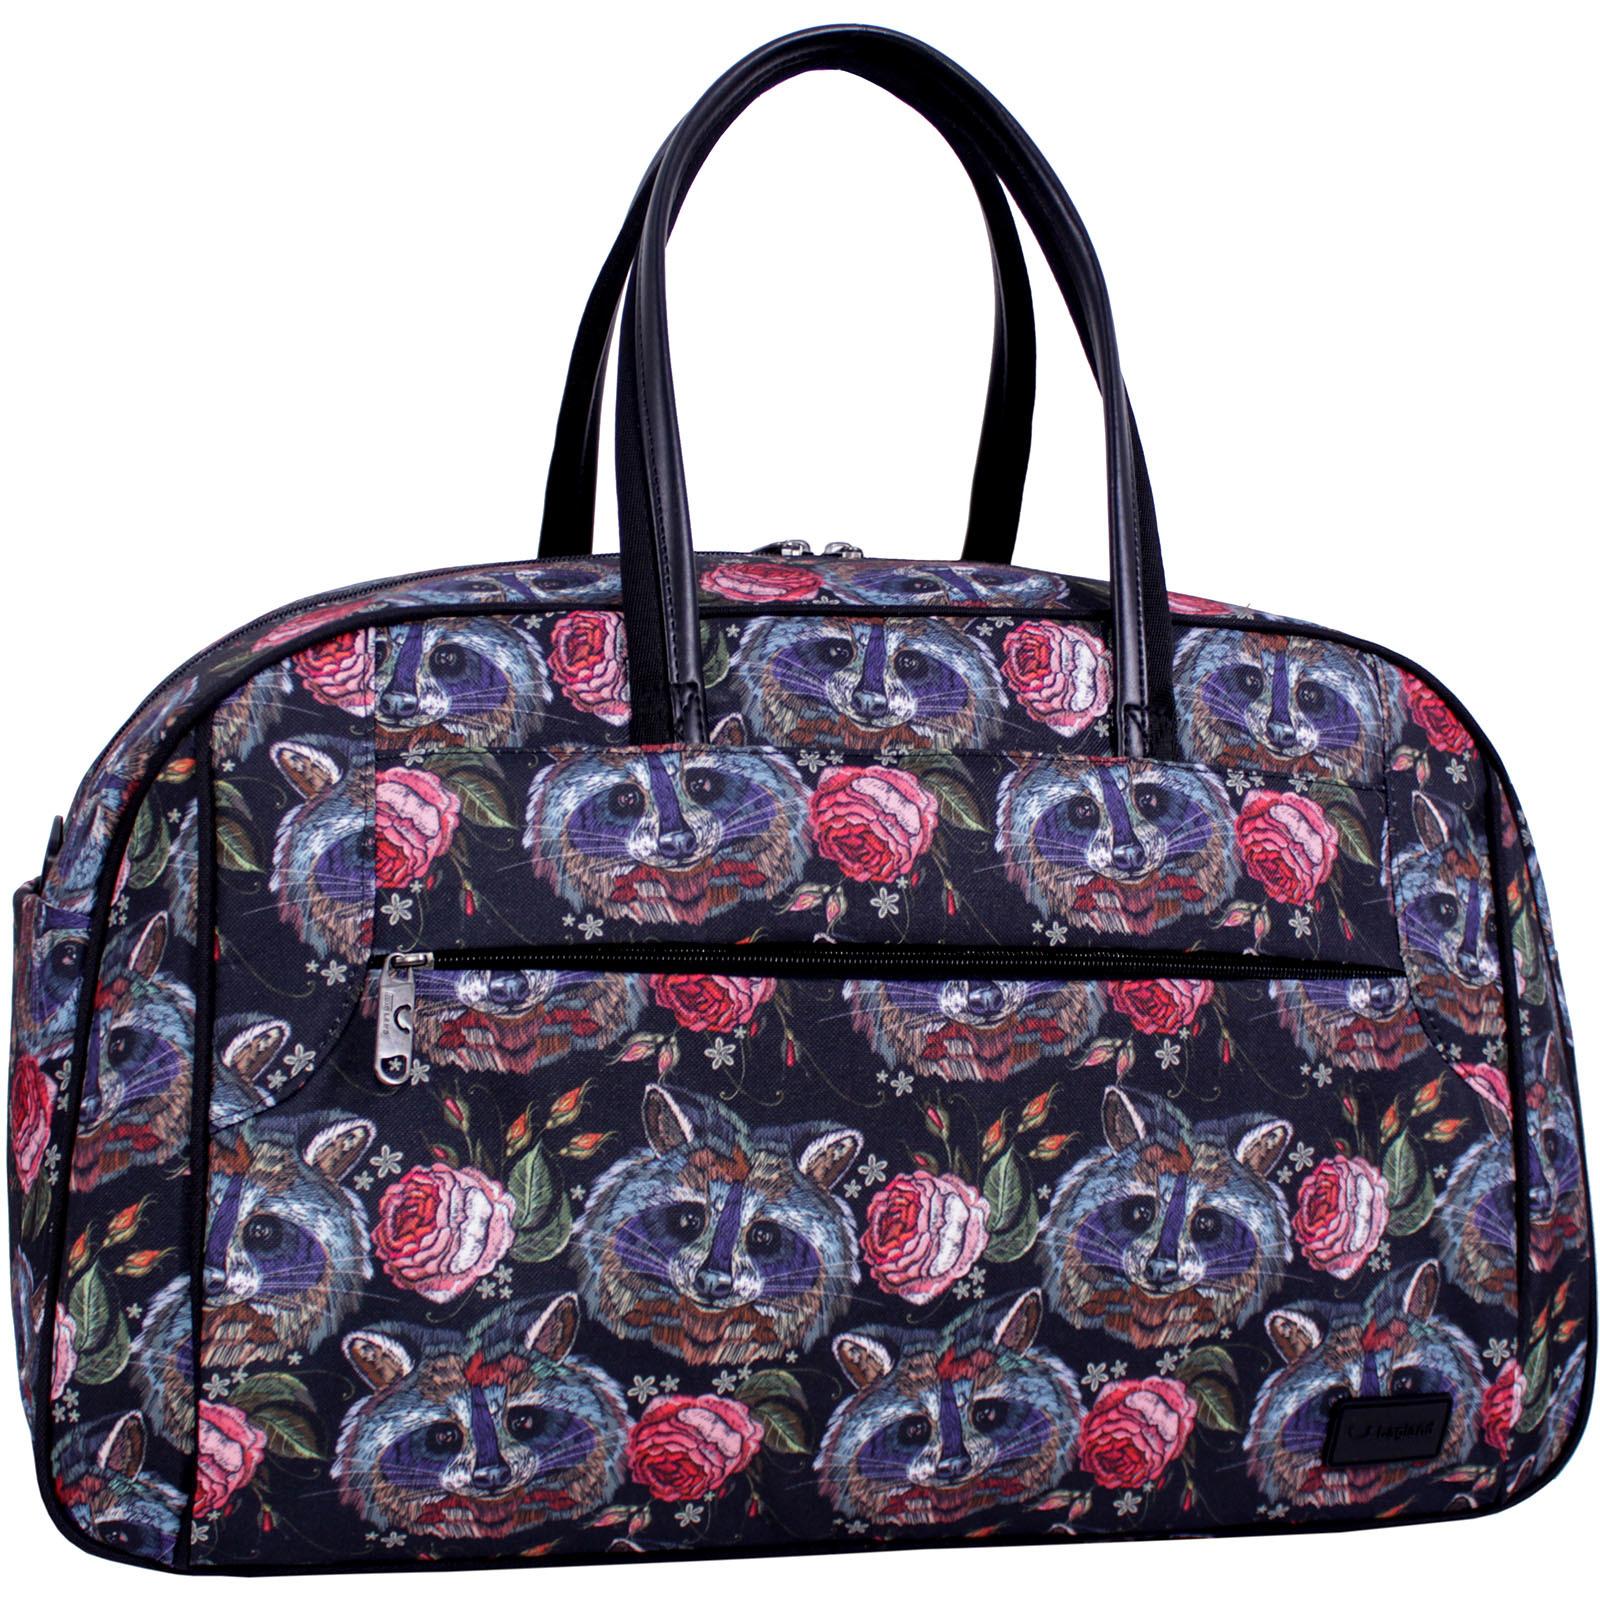 Спортивные сумки Сумка Bagland Тунис 34 л. Сублимация 477 (00390664) IMG_6872_суб.477_.JPG